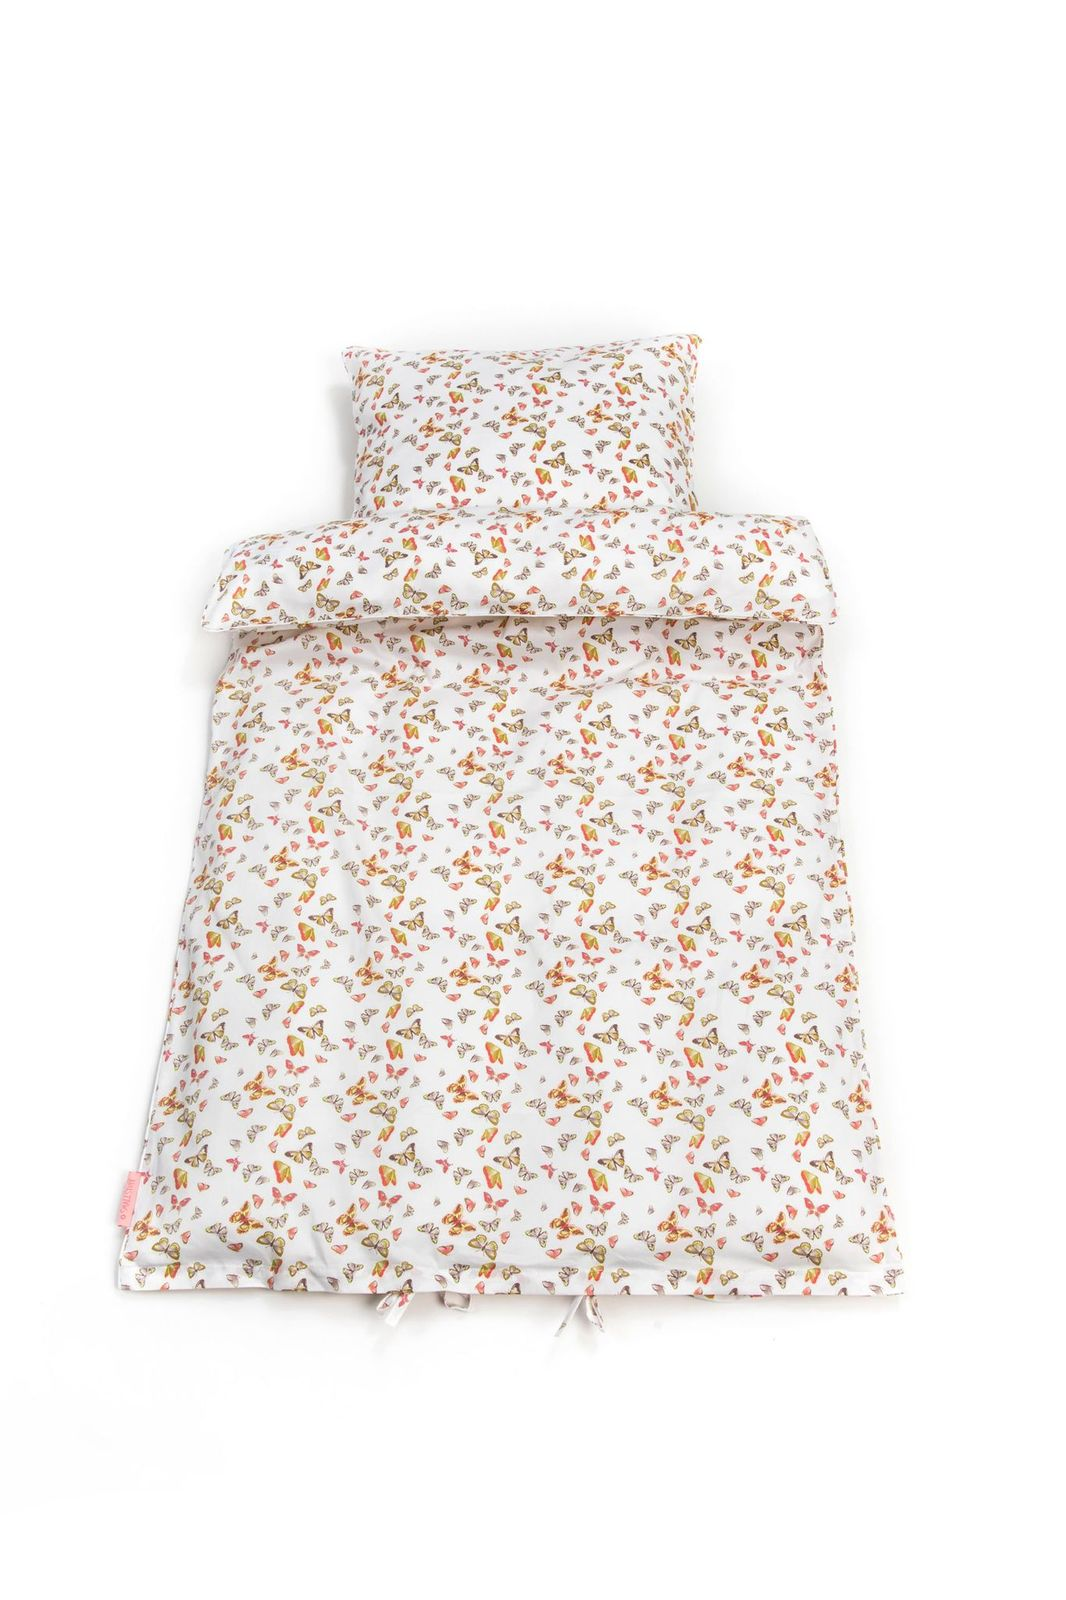 Smallstuff - Bedding - Baby - Multi Butterfly